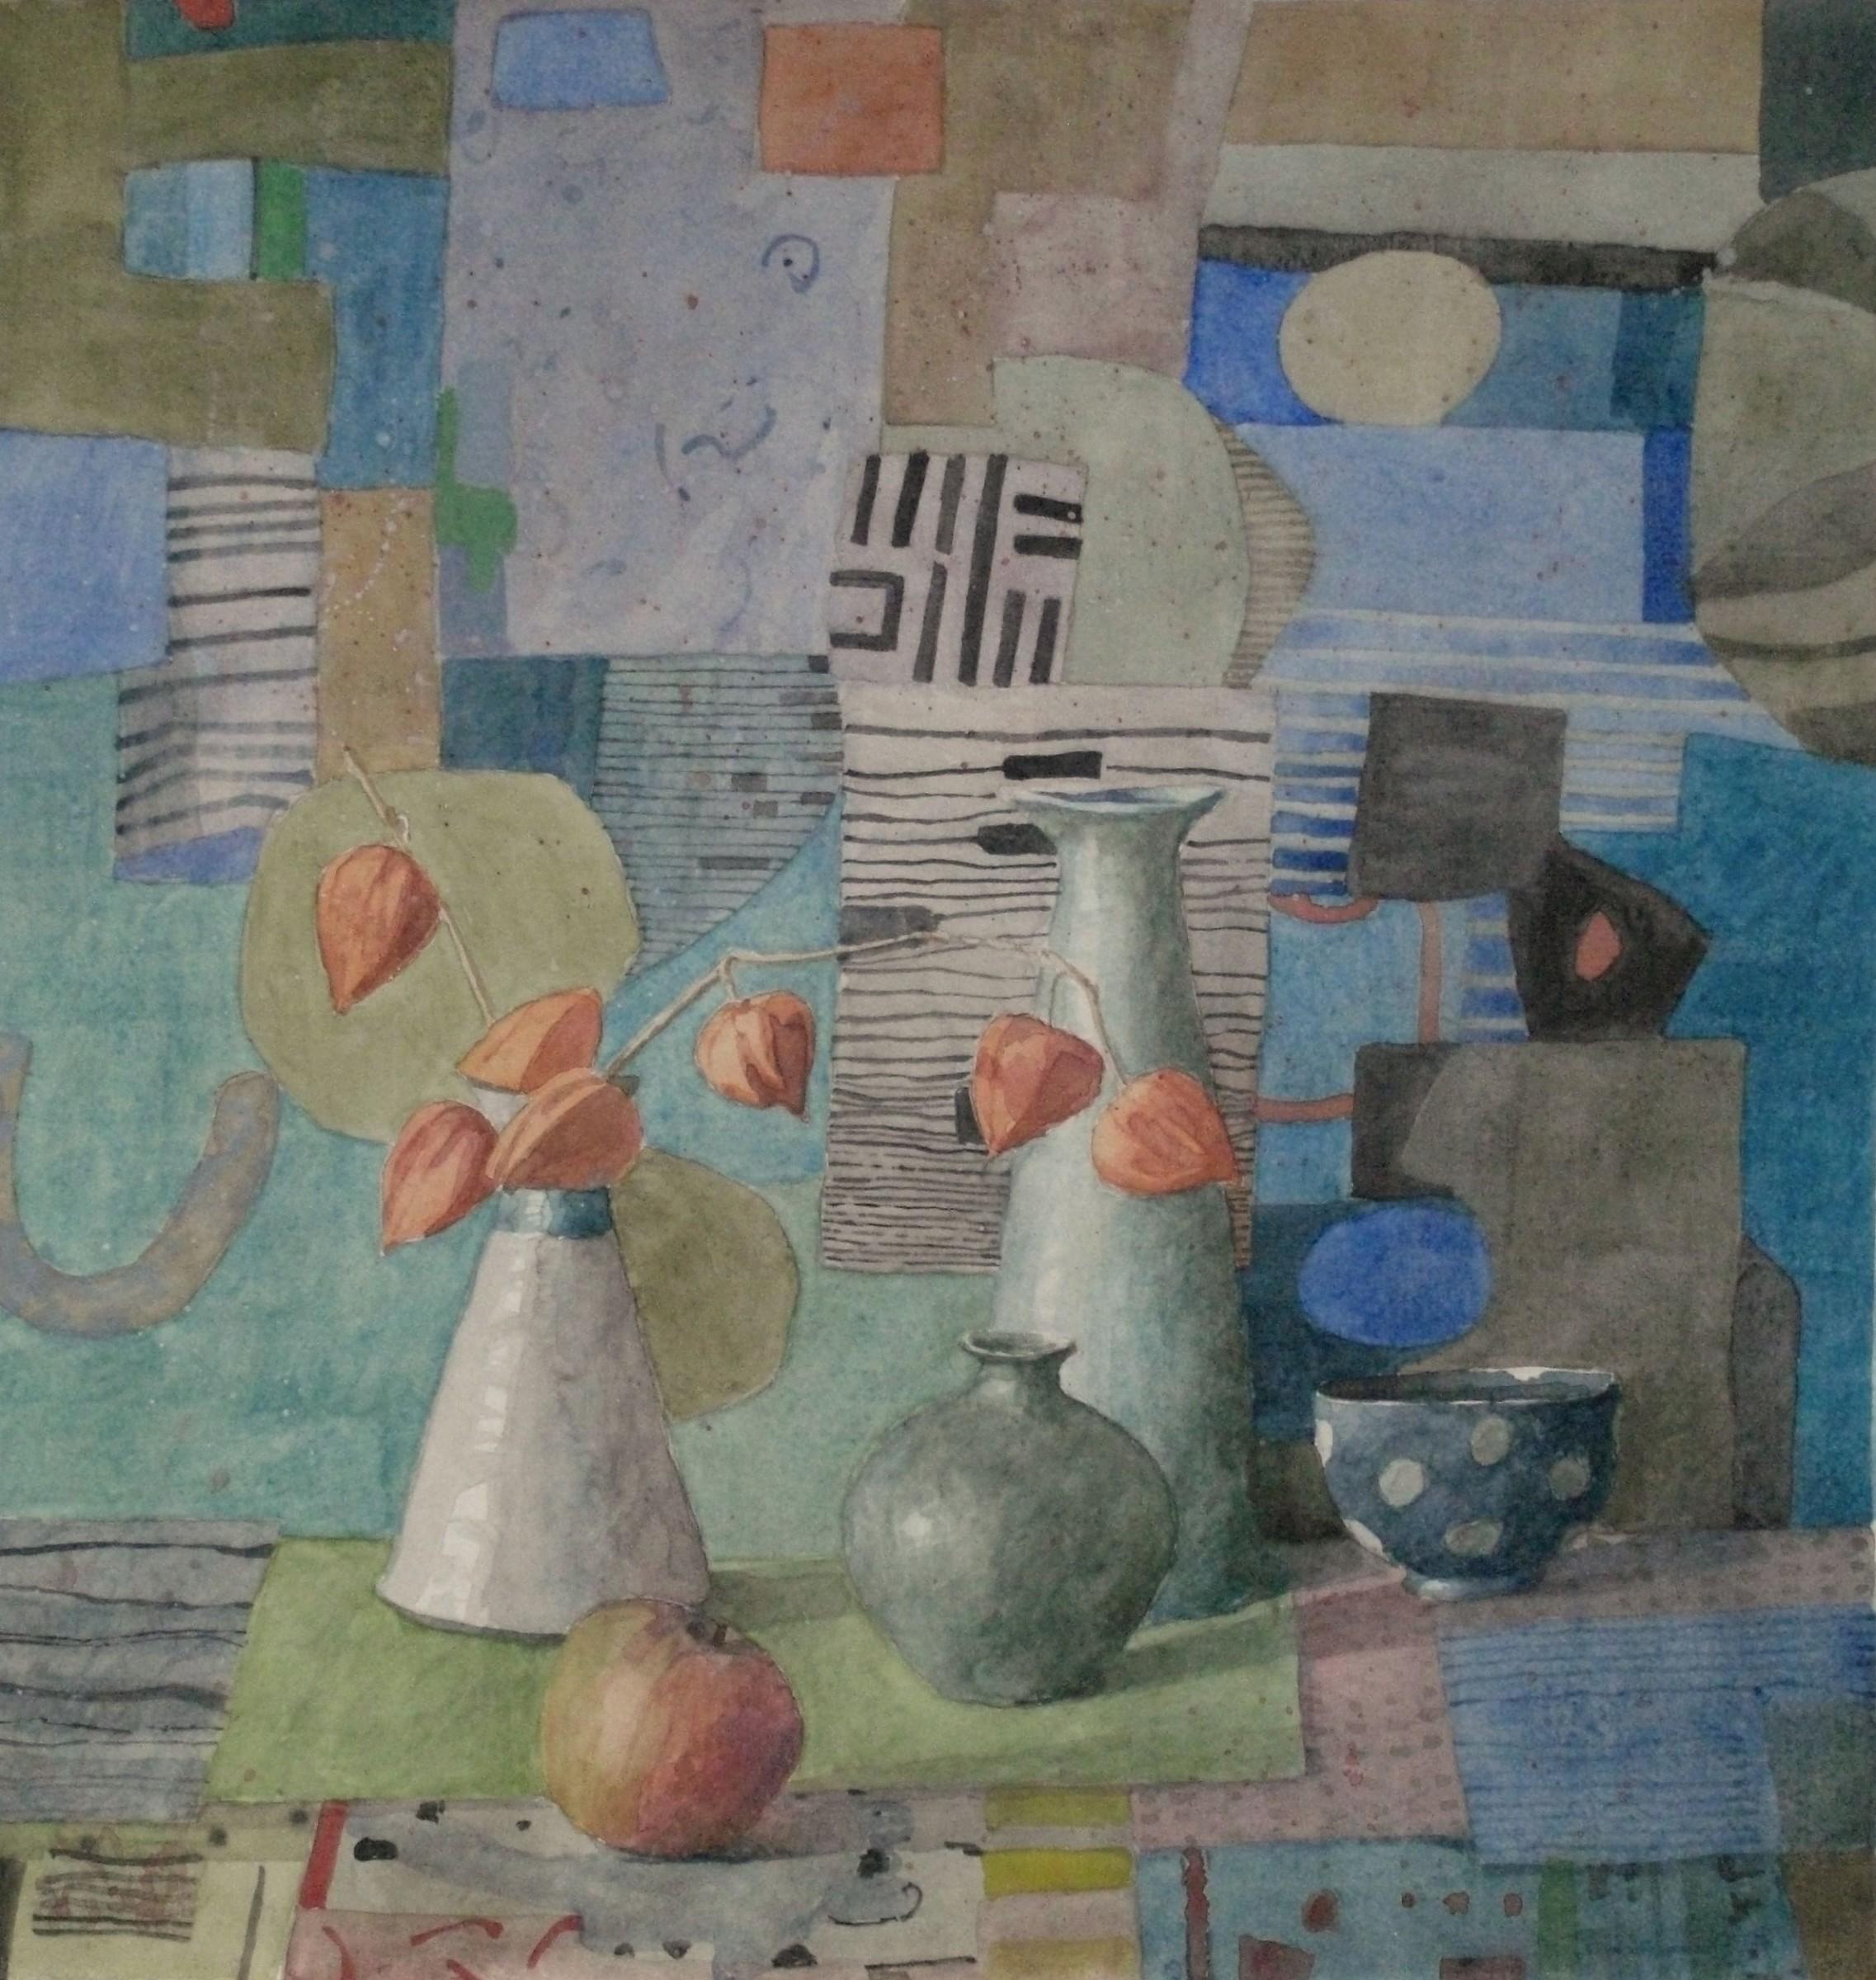 <span class=&#34;link fancybox-details-link&#34;><a href=&#34;/exhibitions/24/works/artworks_standalone10816/&#34;>View Detail Page</a></span><div class=&#34;artist&#34;><span class=&#34;artist&#34;><strong>Annie Williams</strong></span></div><div class=&#34;title&#34;><em>December Still Life</em></div><div class=&#34;medium&#34;>watercolour</div><div class=&#34;dimensions&#34;>52x52cm</div>